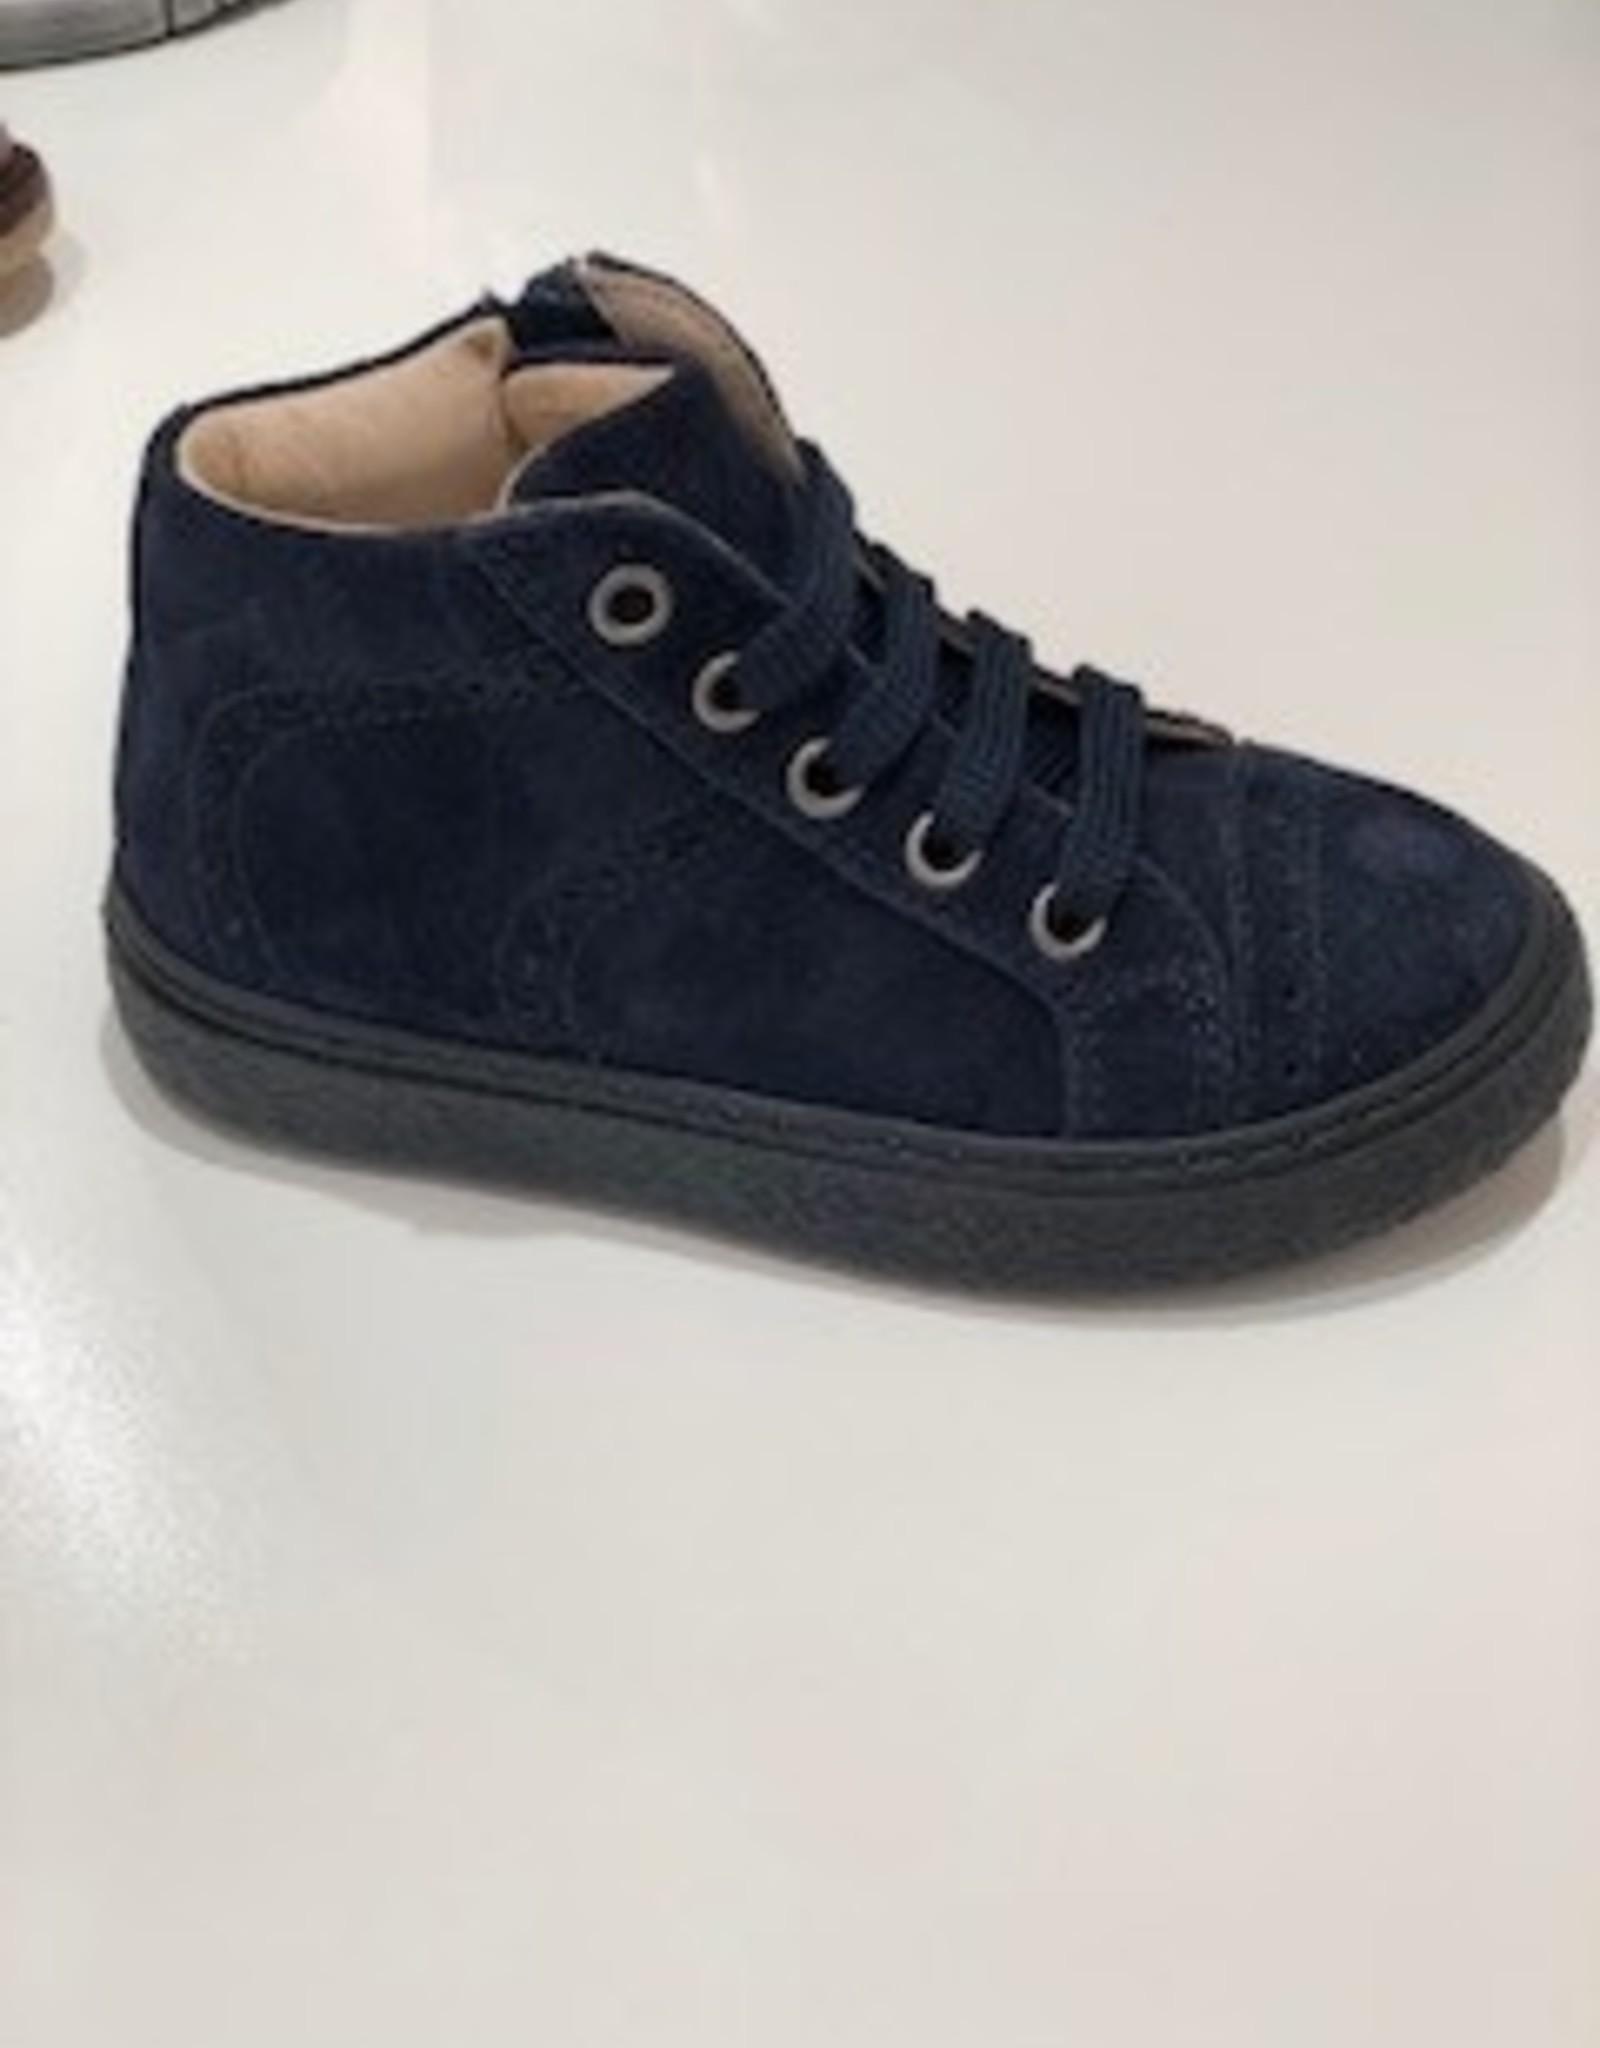 Lunella 849 blauw veter/rits